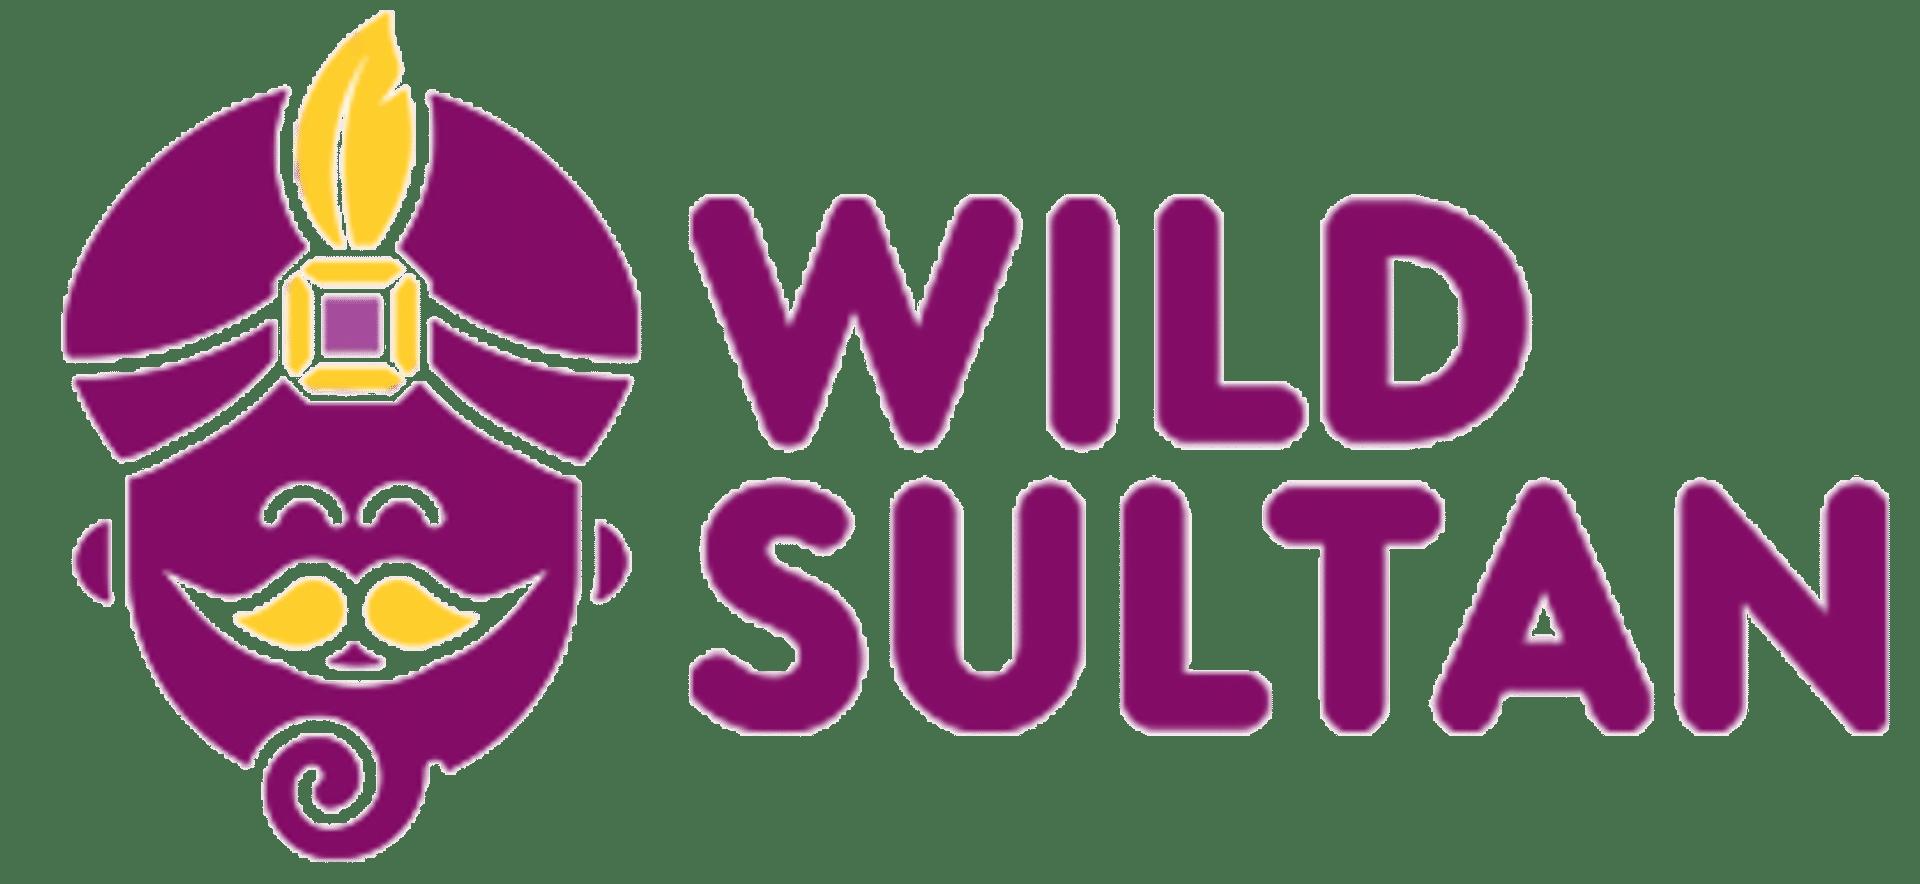 Wild sultant casino